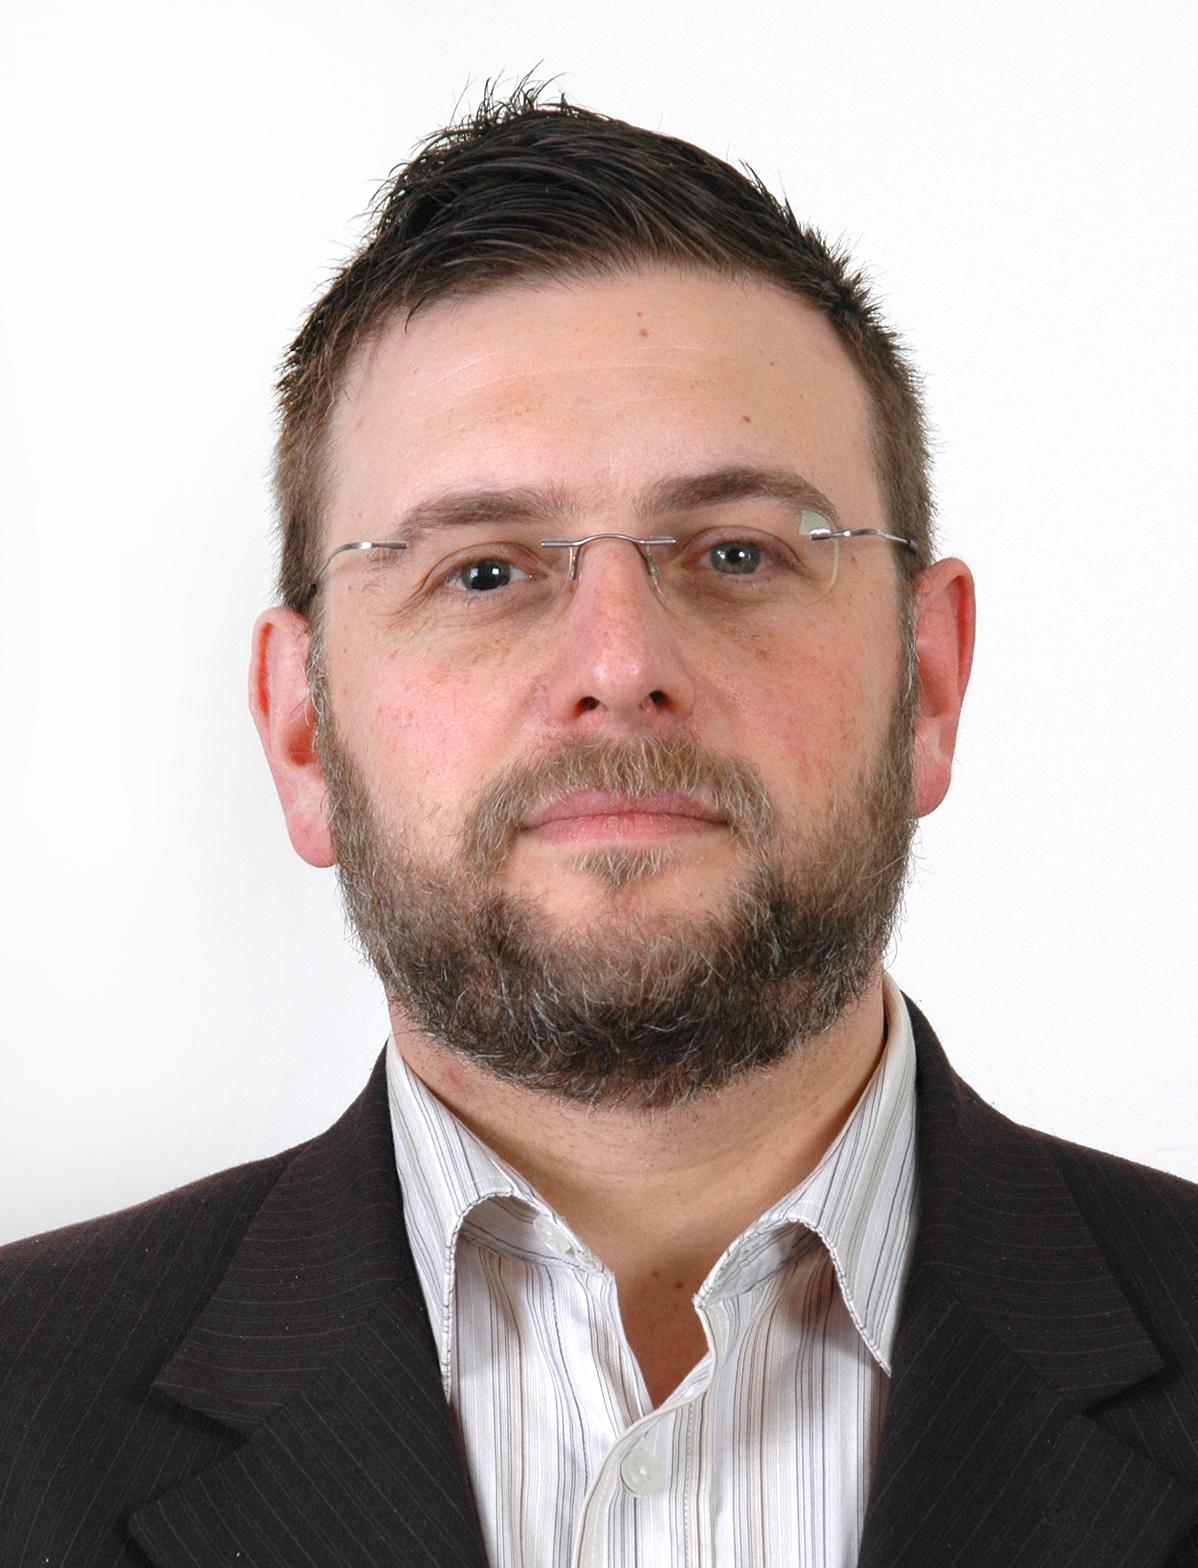 Alain Klimowski